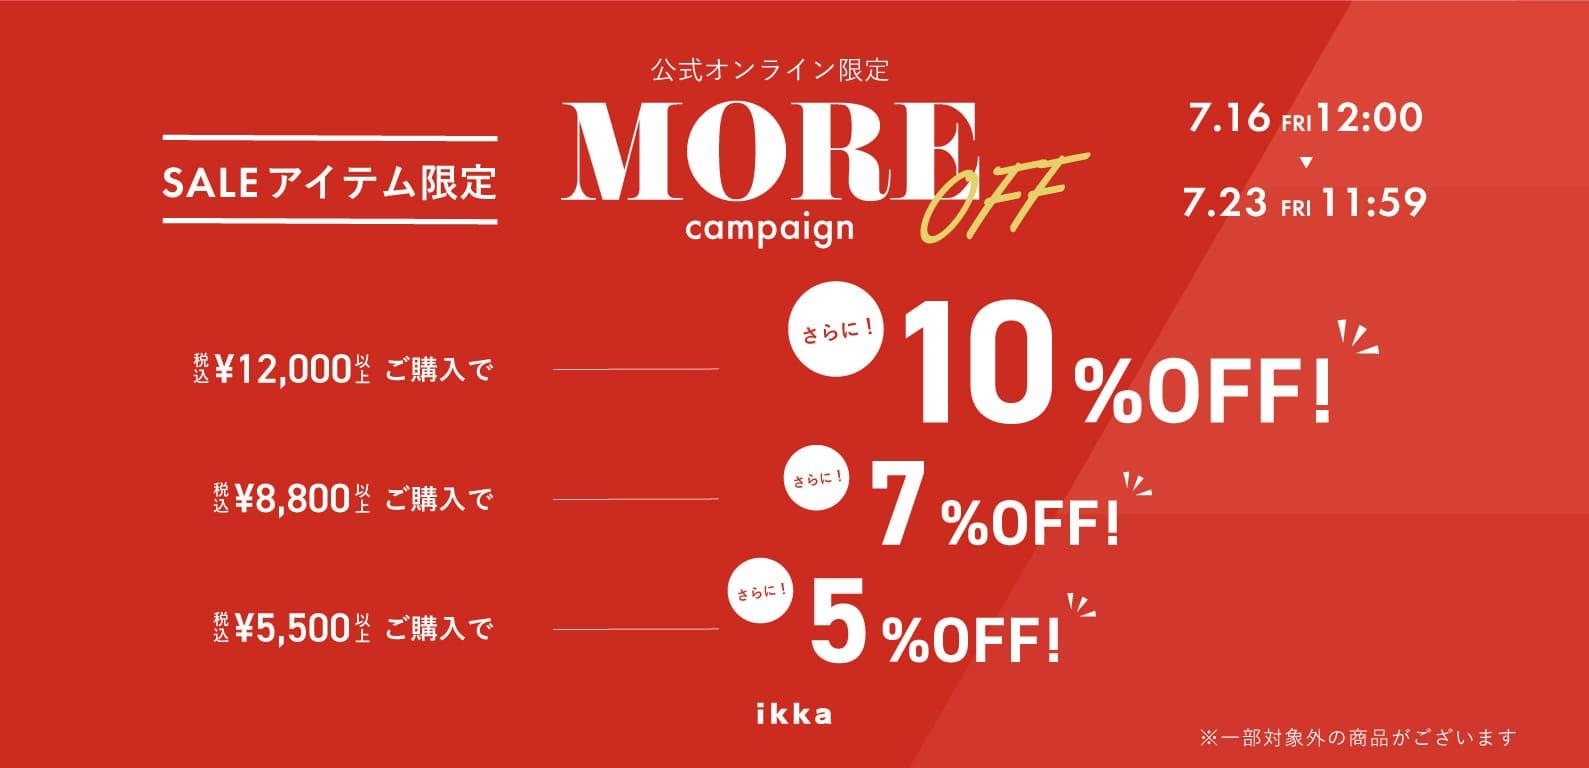 ikka   MORE OFF キャンペーン SALE